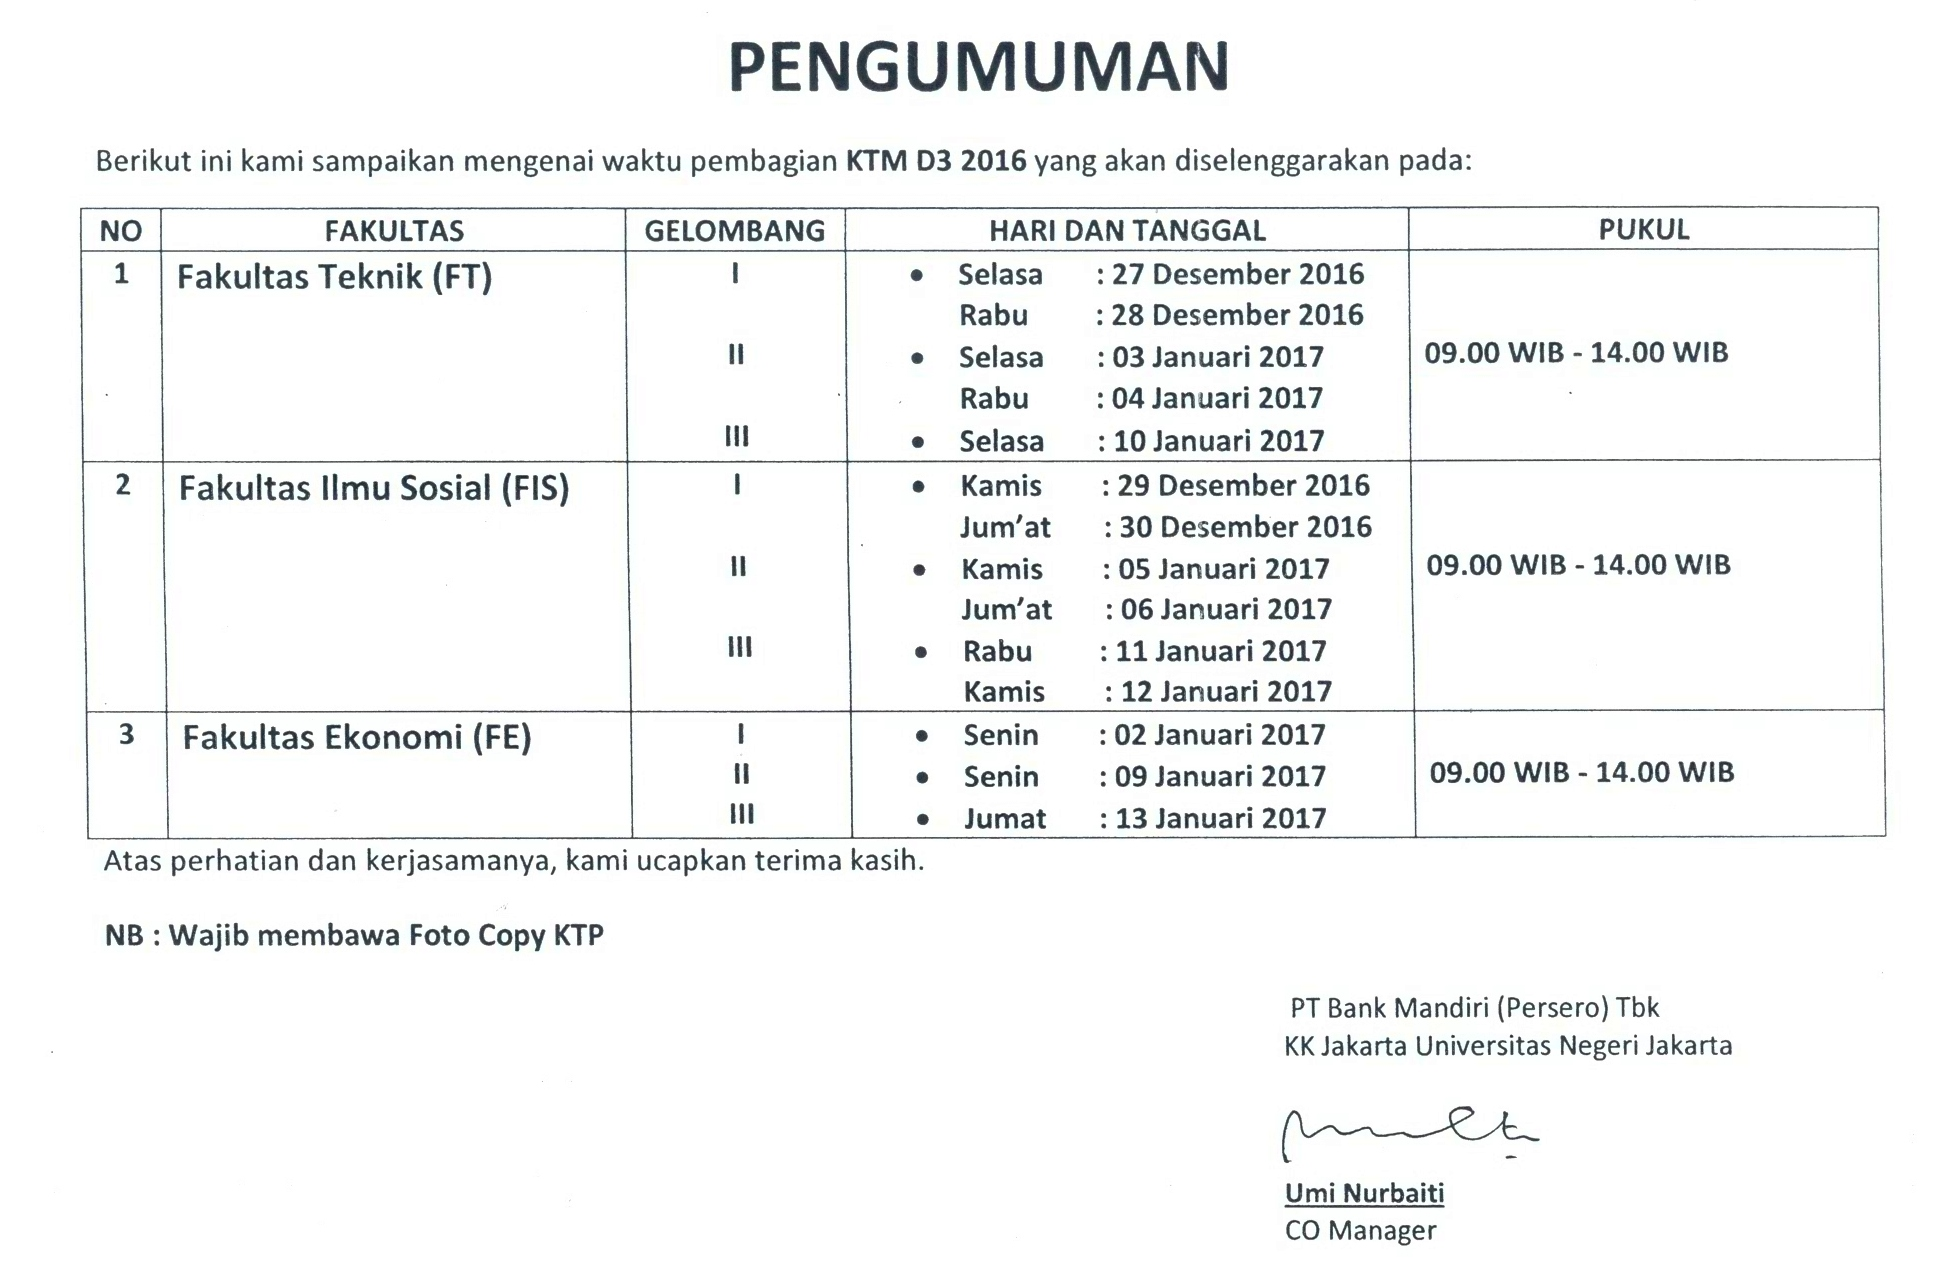 Info pembagian KTM D3